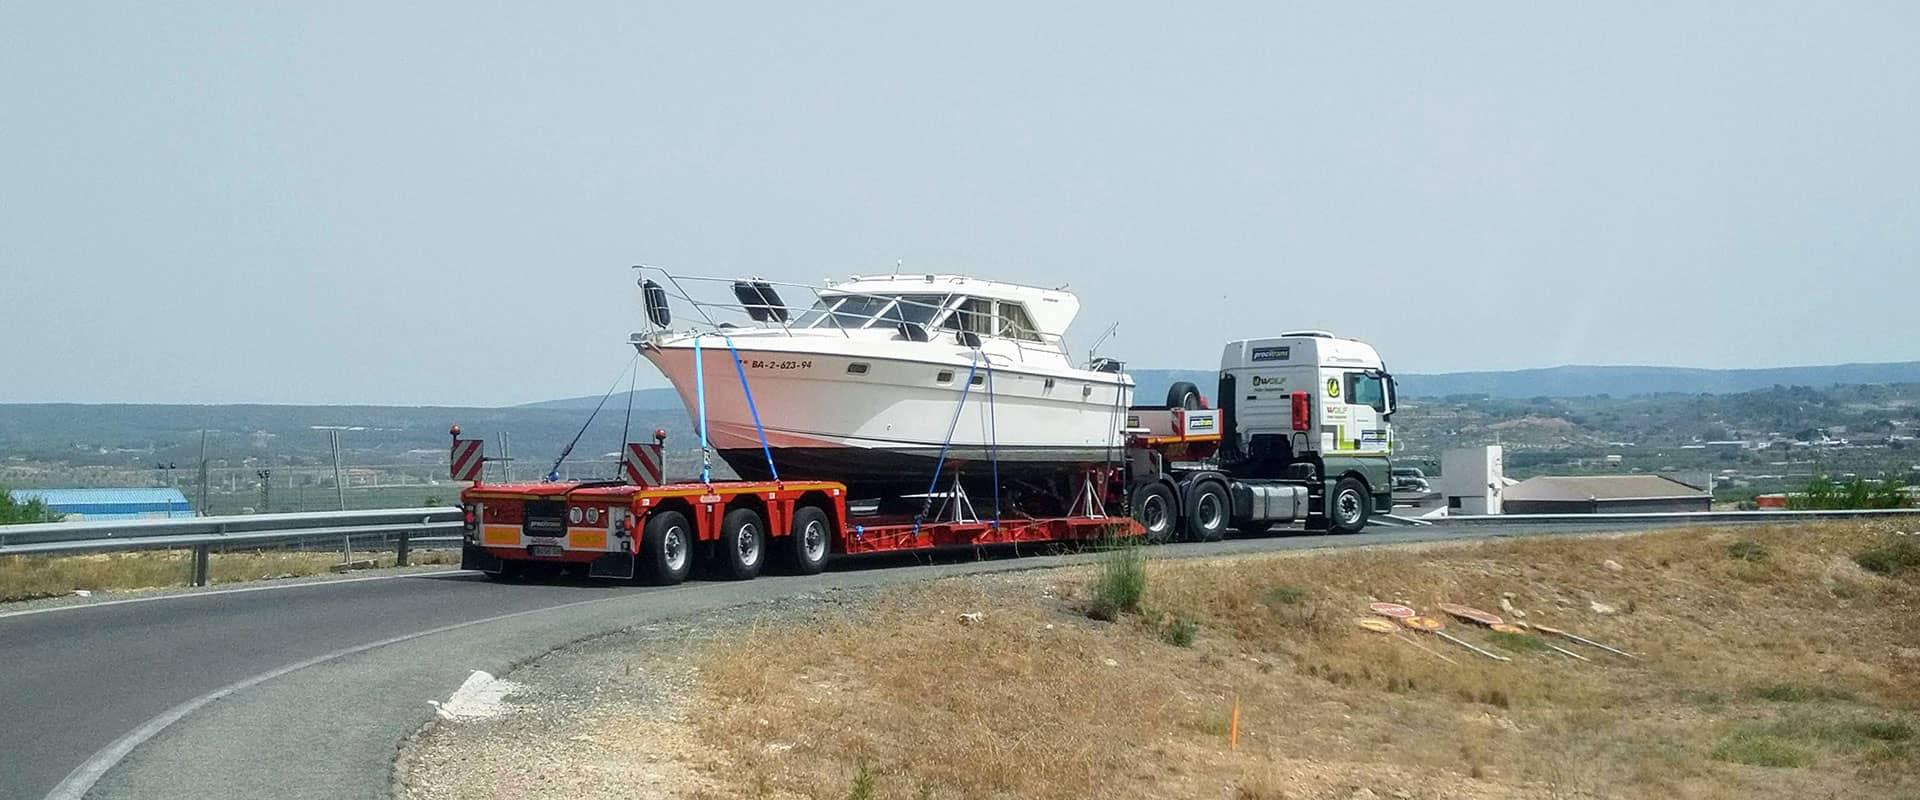 heavy equipment transport Procitrans 1